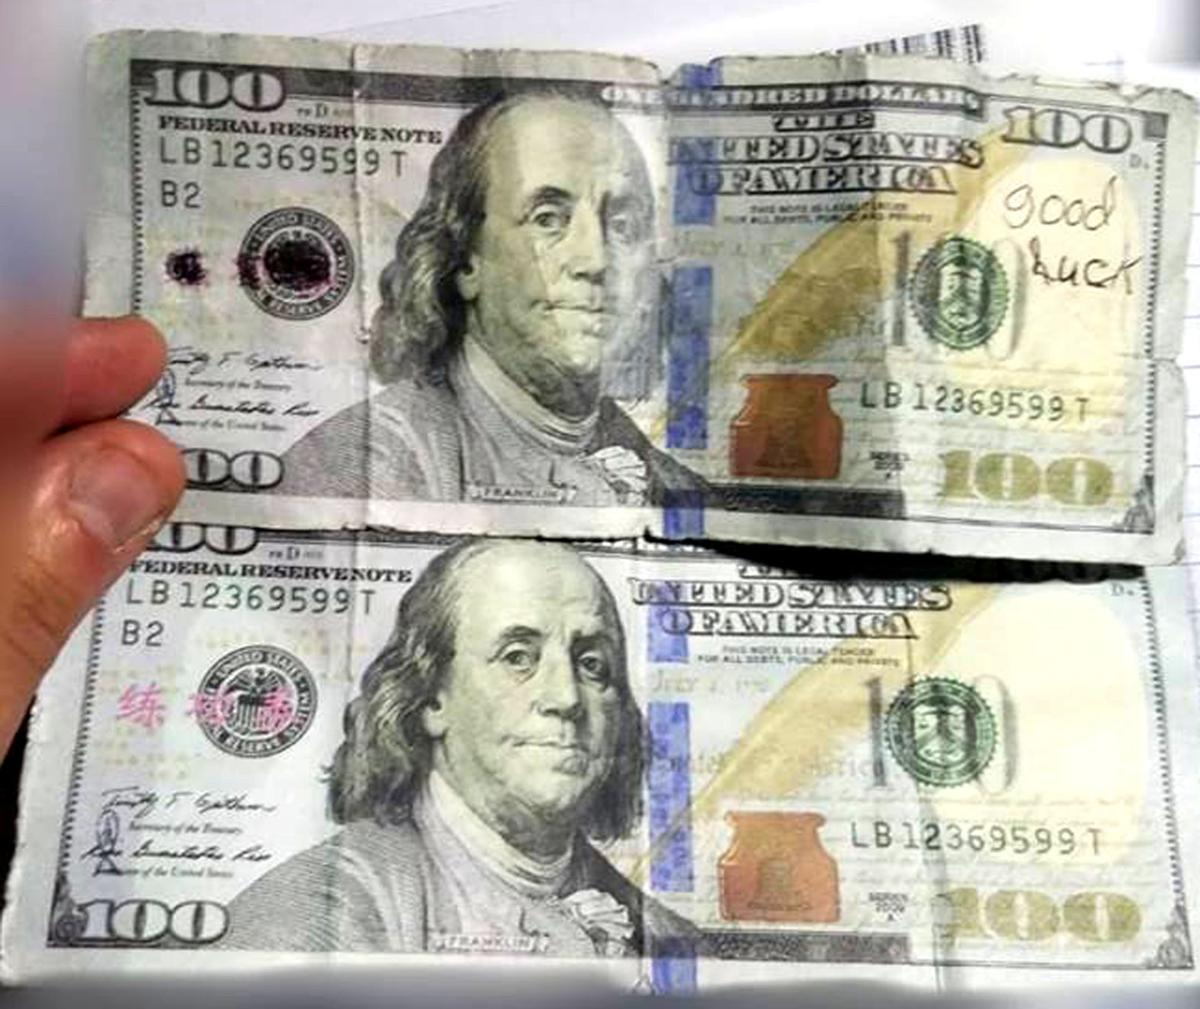 Fake Money With Chinese Symbols